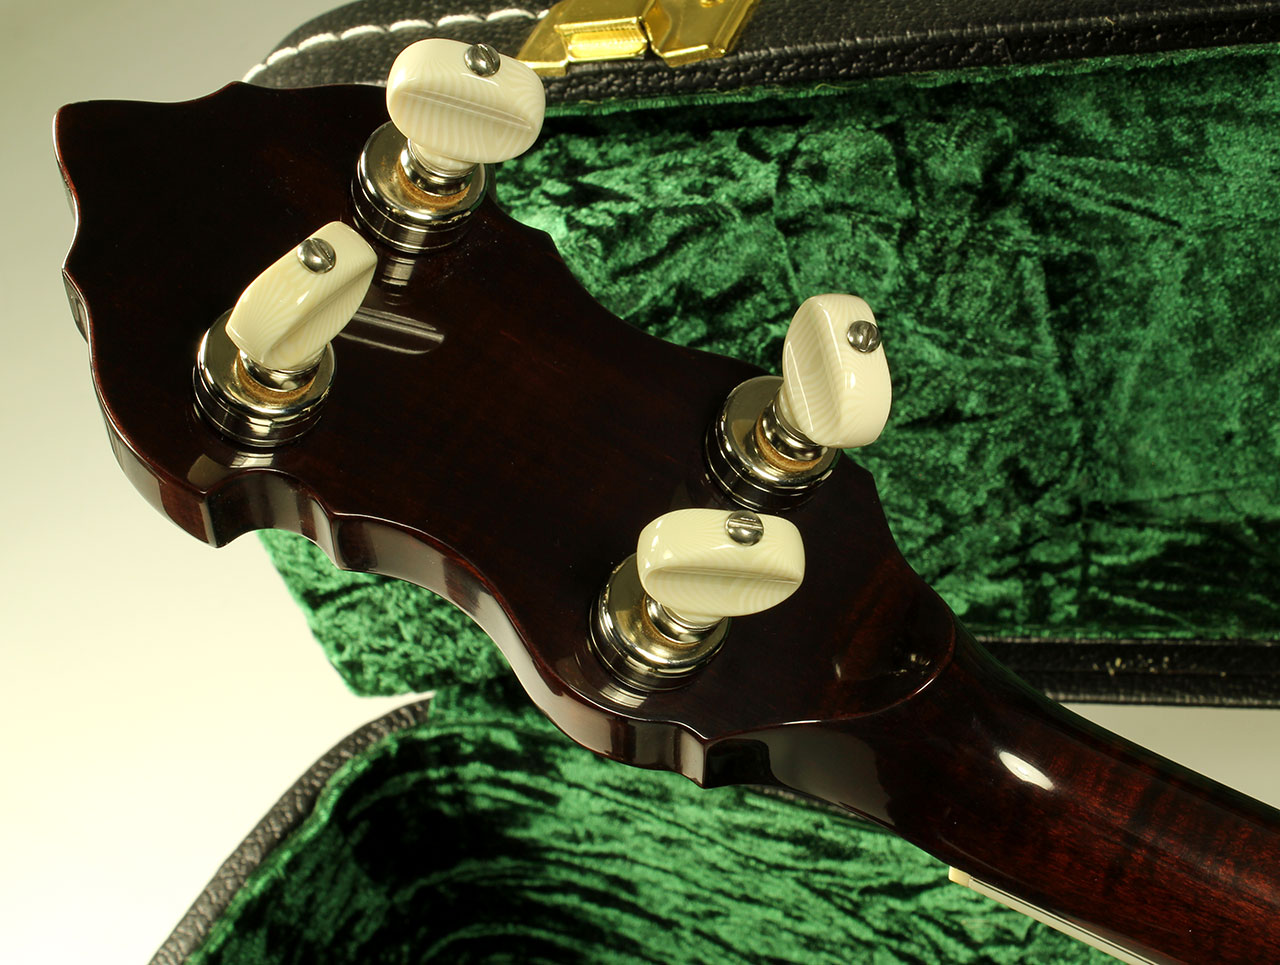 Huber-berkshire-trutone-banjo-head-rear-1